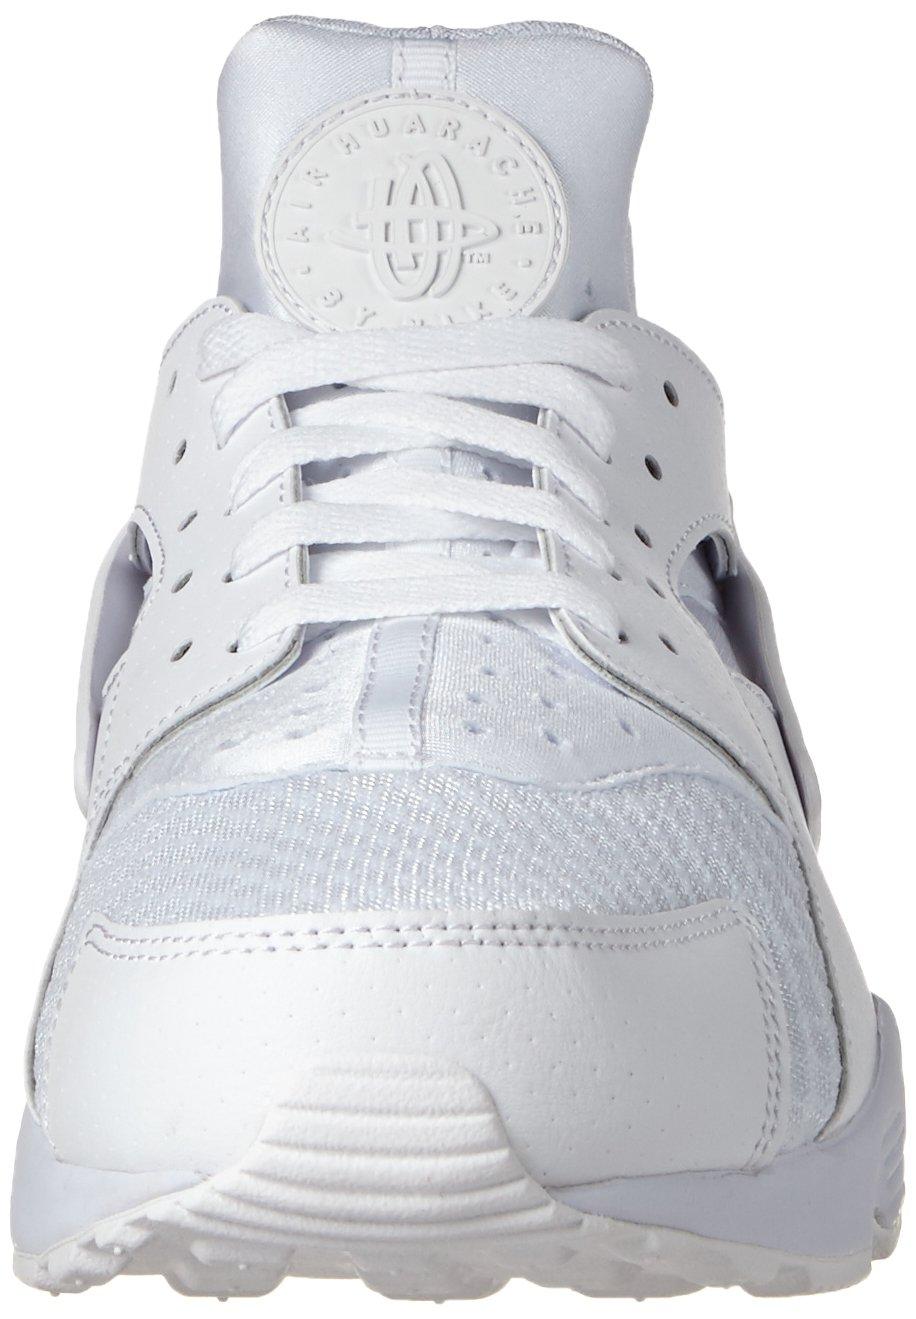 Nike Air Huarache Blanco Zapatillas Platinum) de Gimnasia Gimnasia